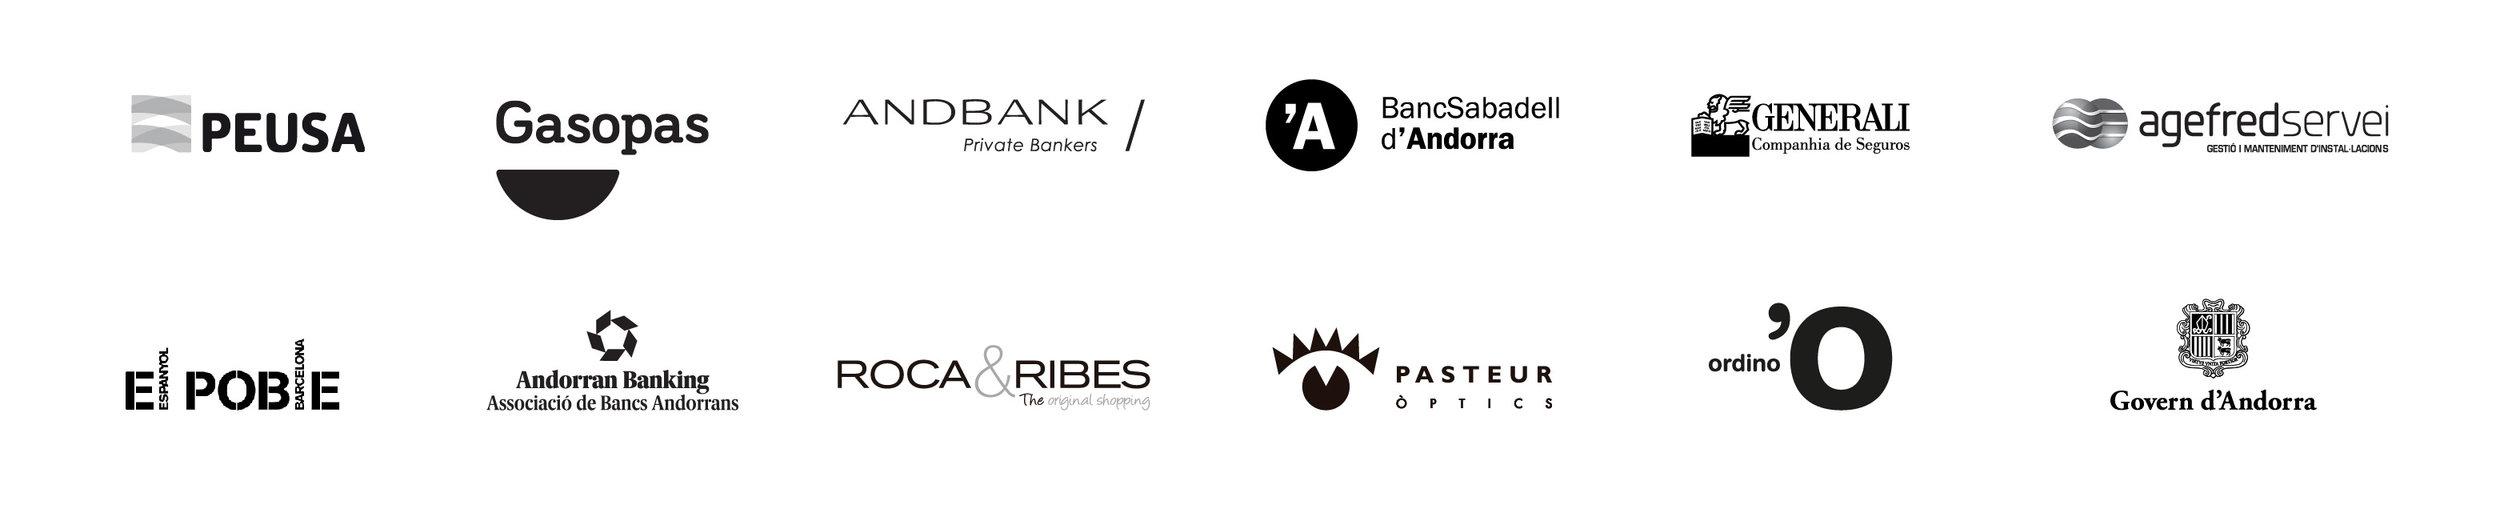 logos_clients-01.jpg